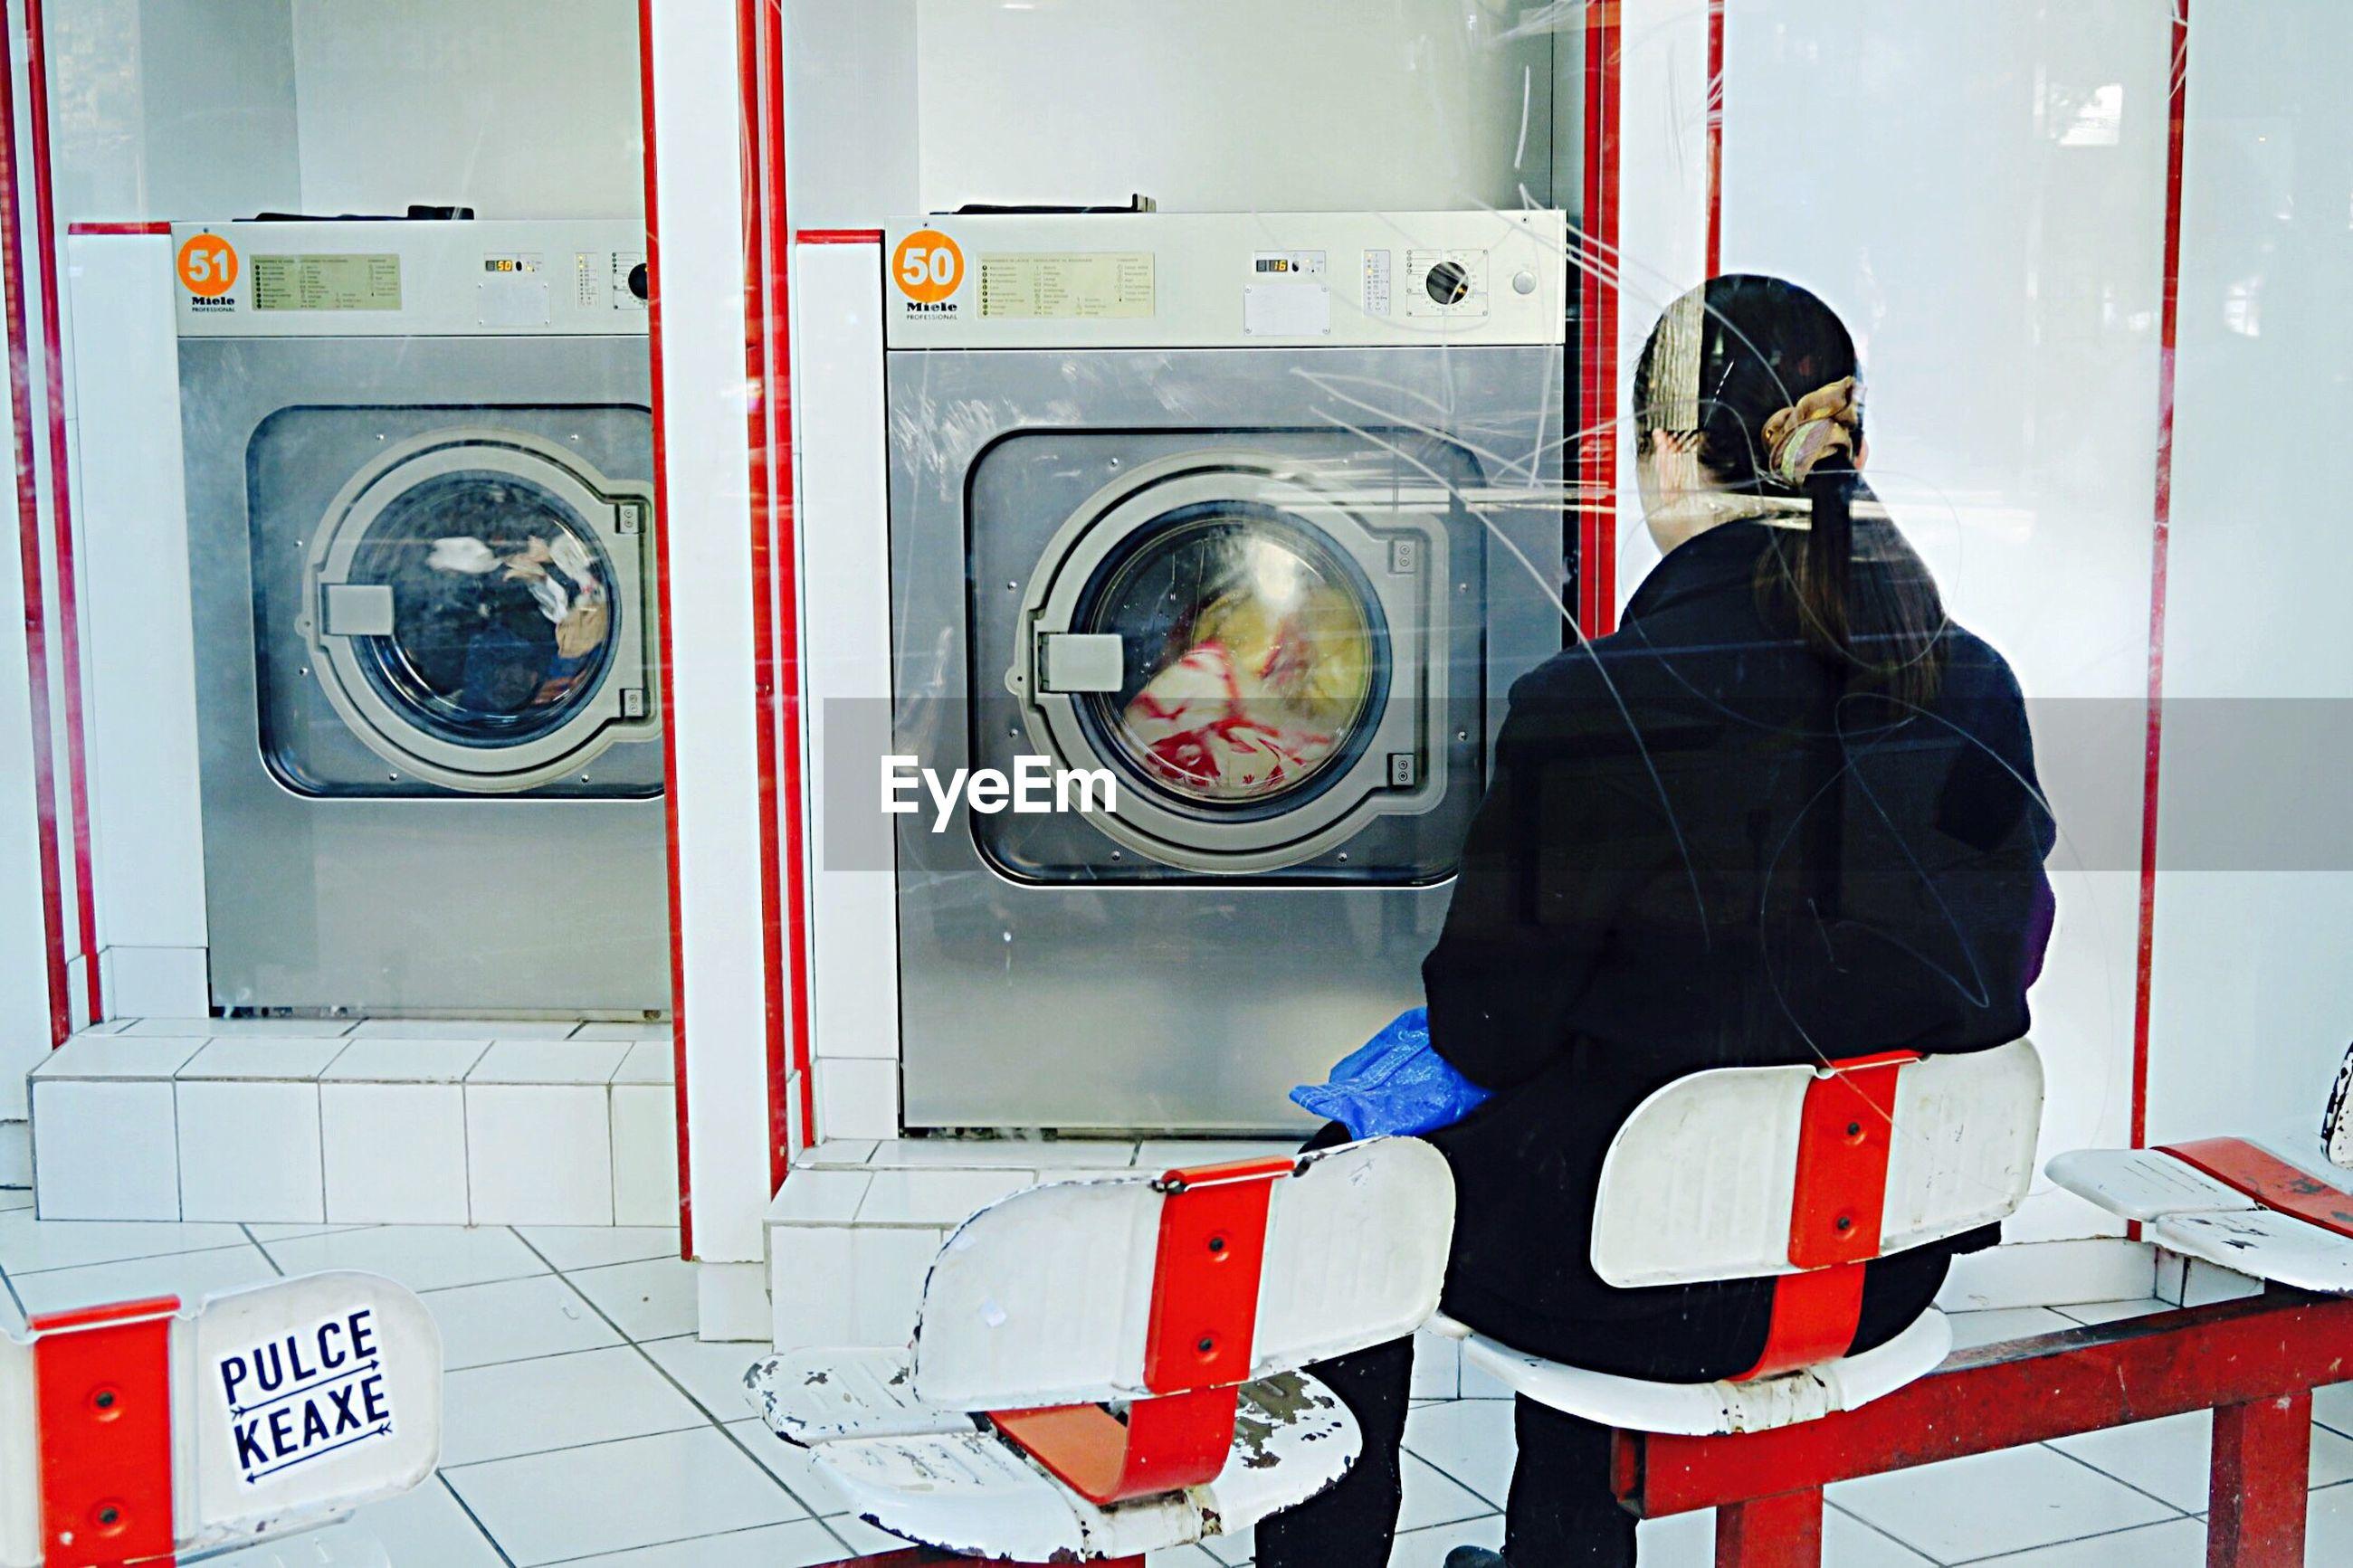 MAN WEARING MASK IN BATHROOM